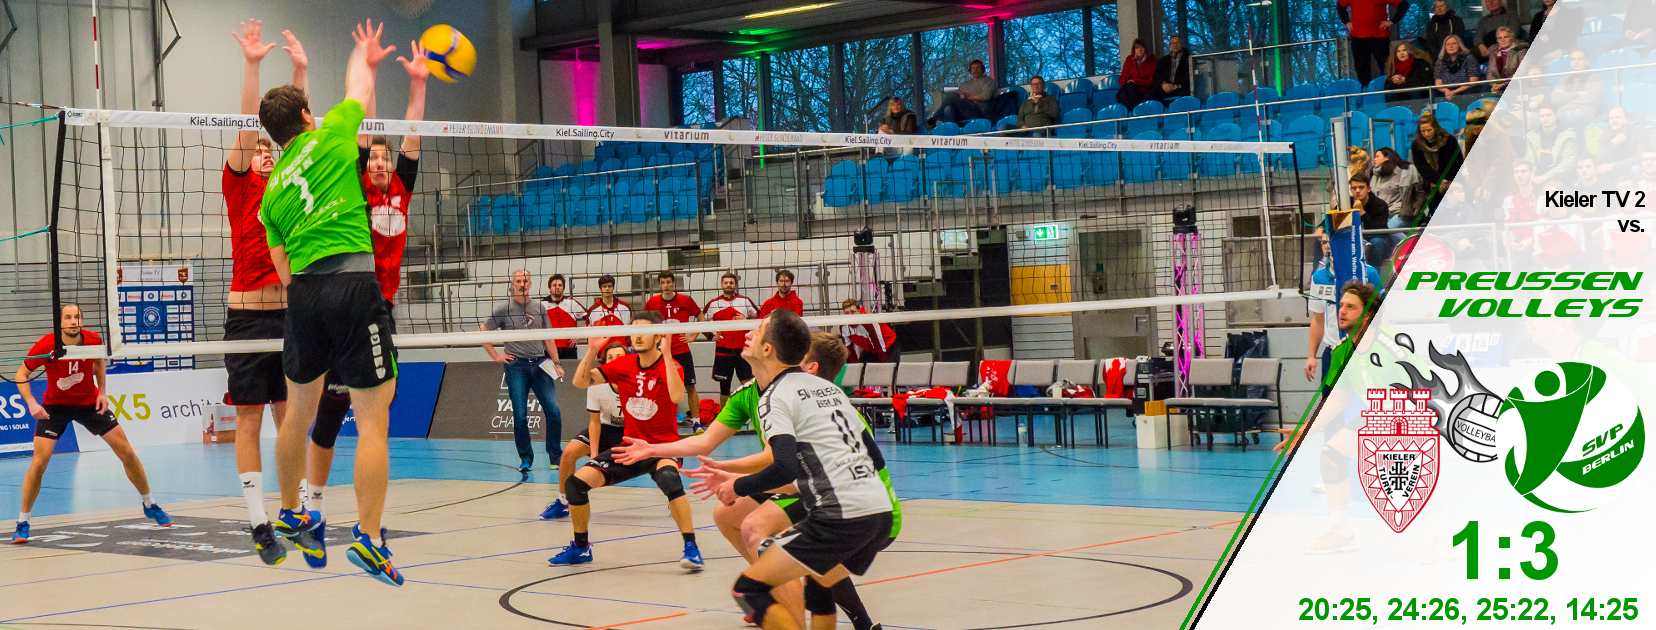 12. Spieltag gegen den Kieler TV 2